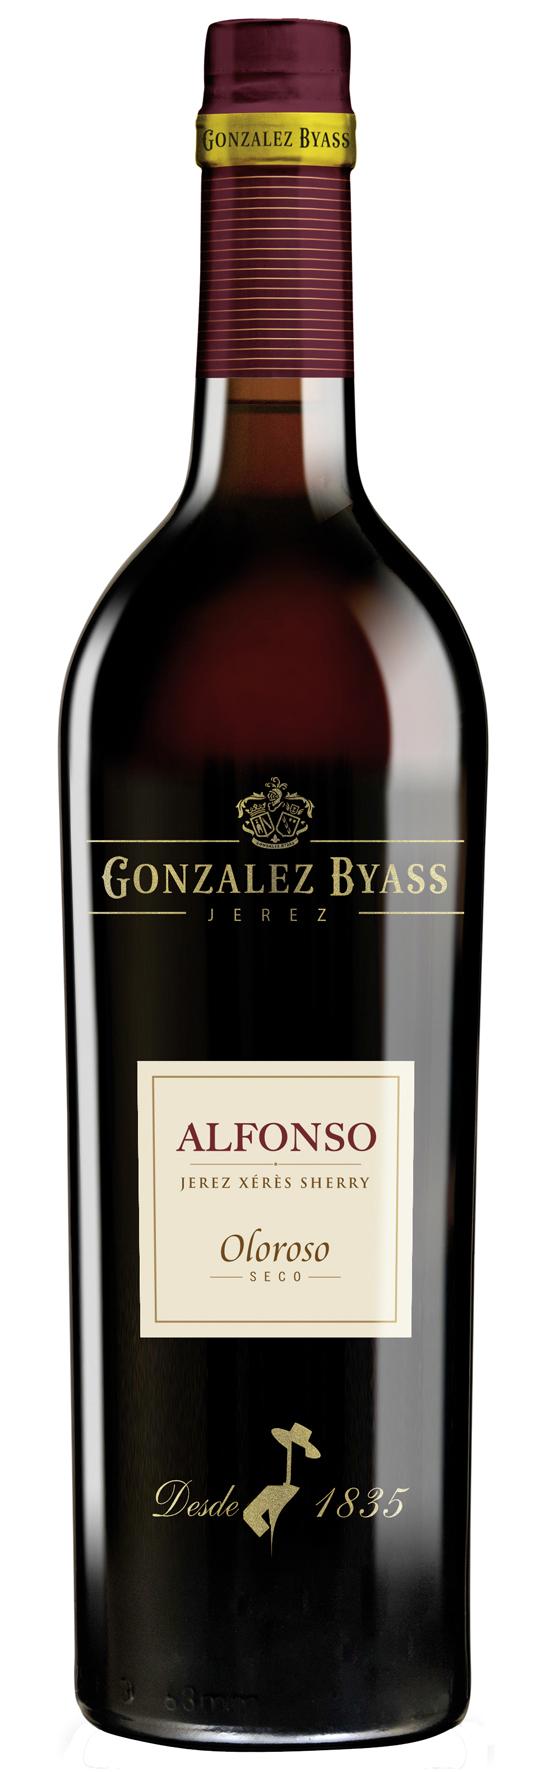 Alfonso Oloroso seco GONZALEZ BYASS